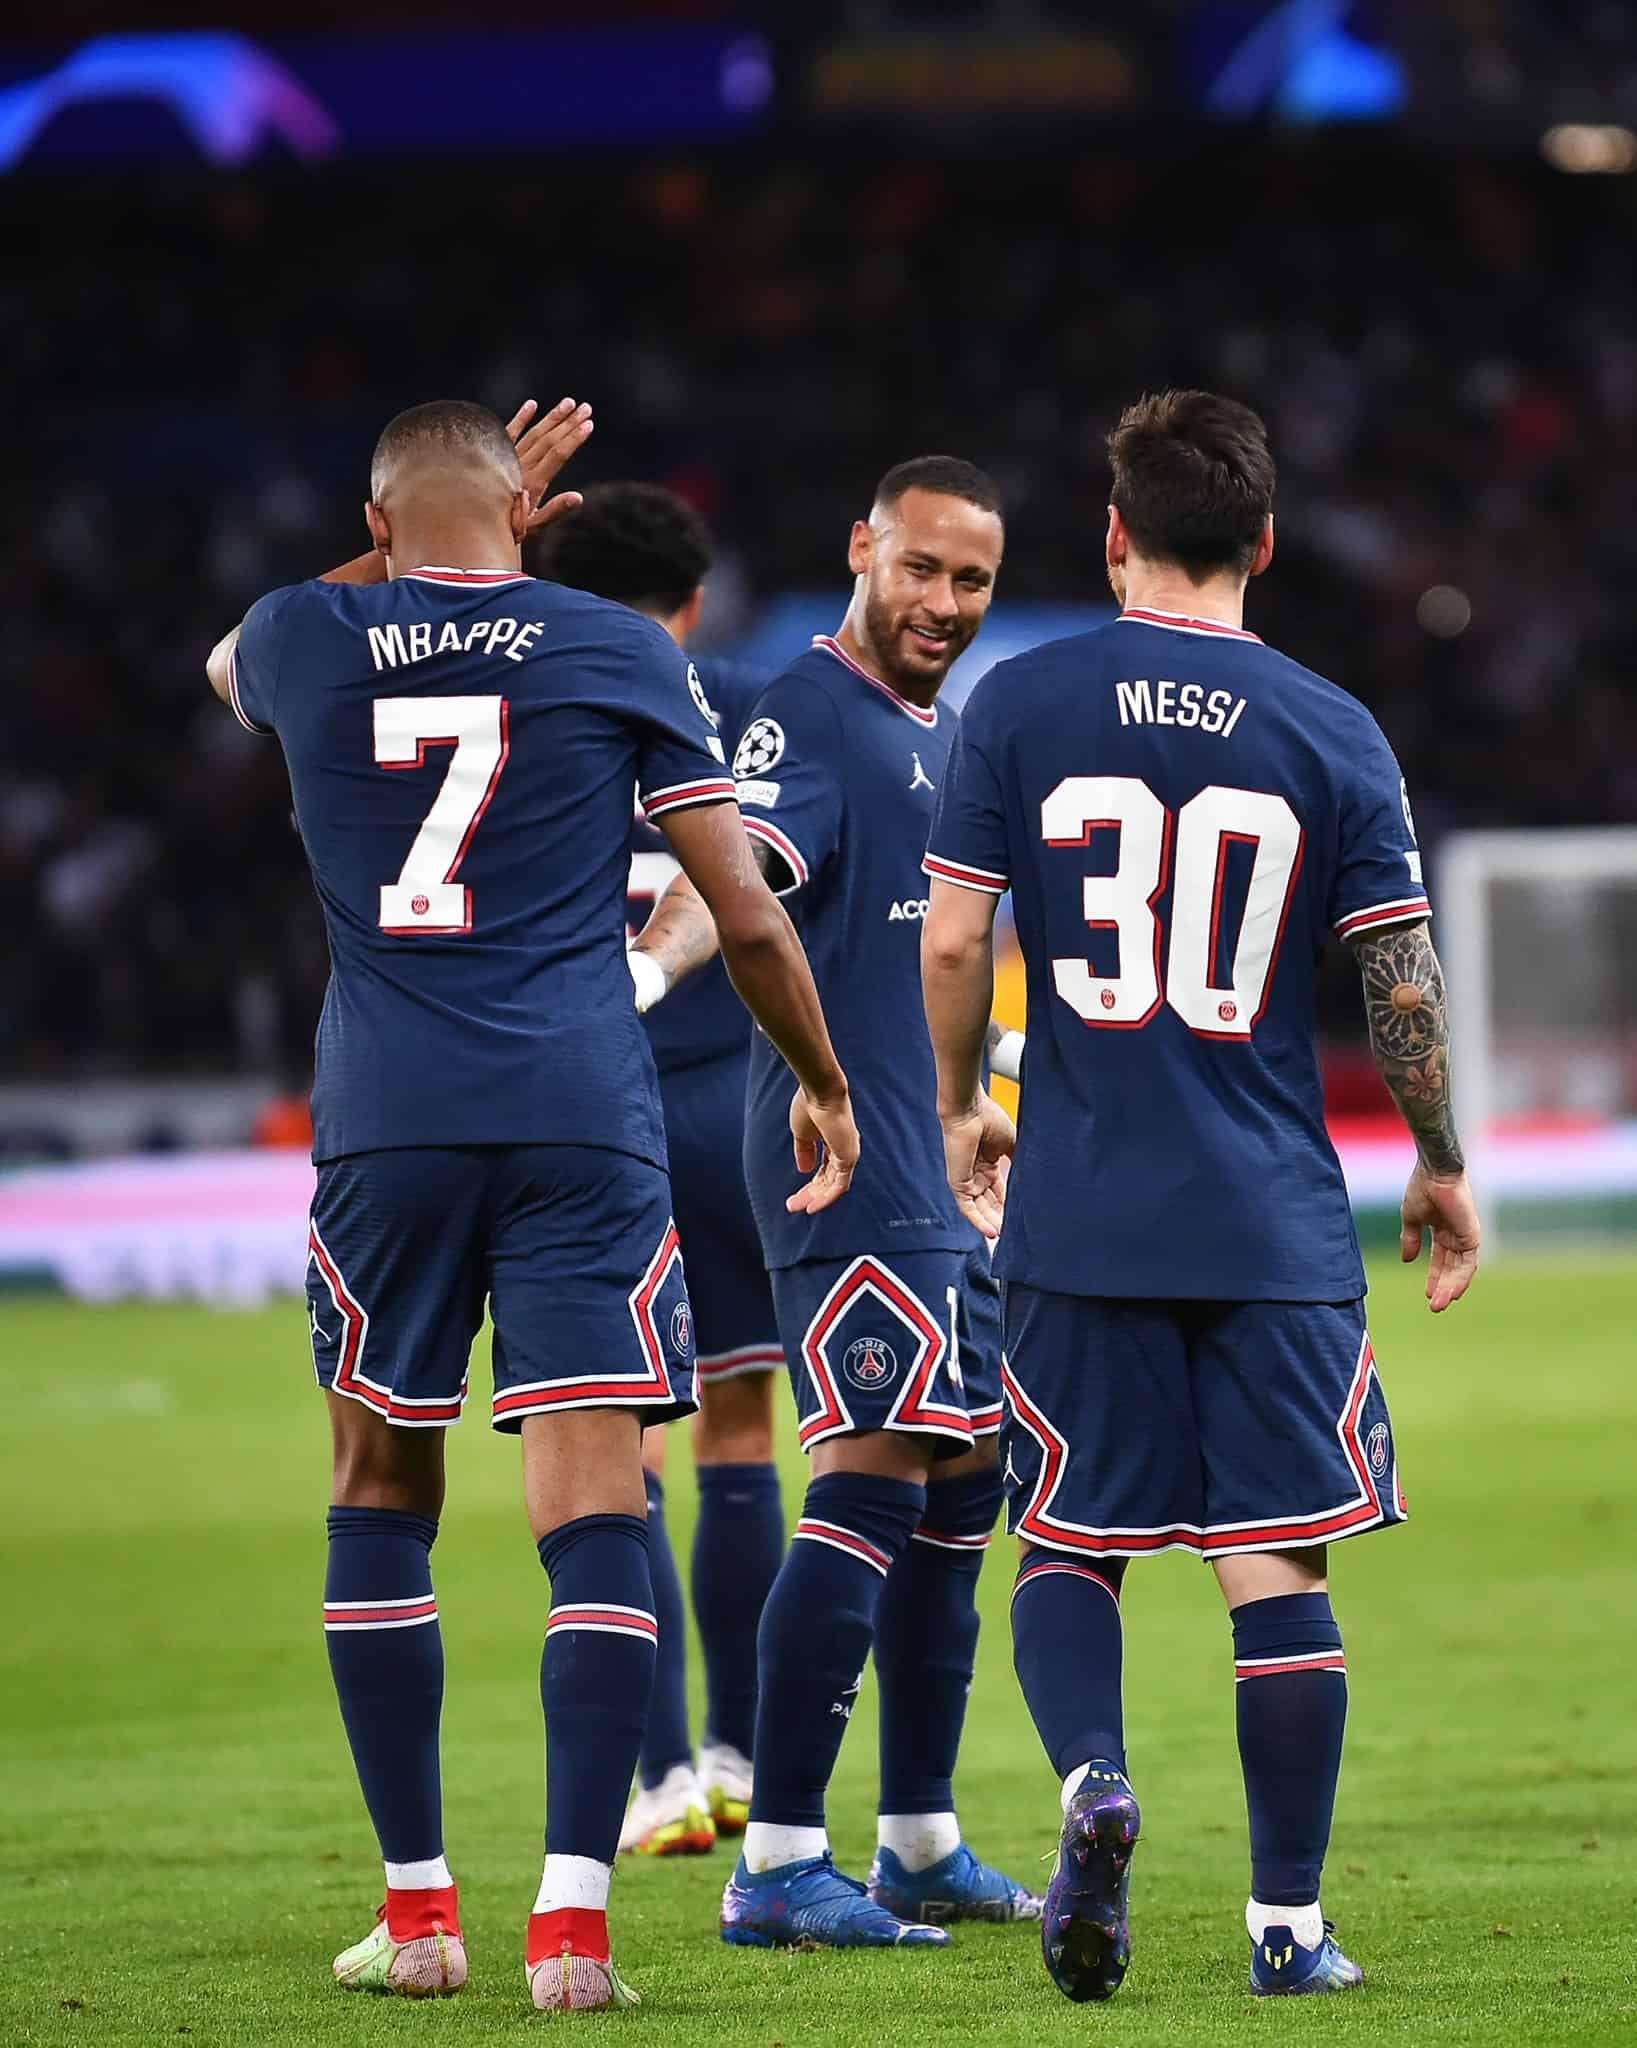 Ponturi Rennes vs PSG - Ligue 1